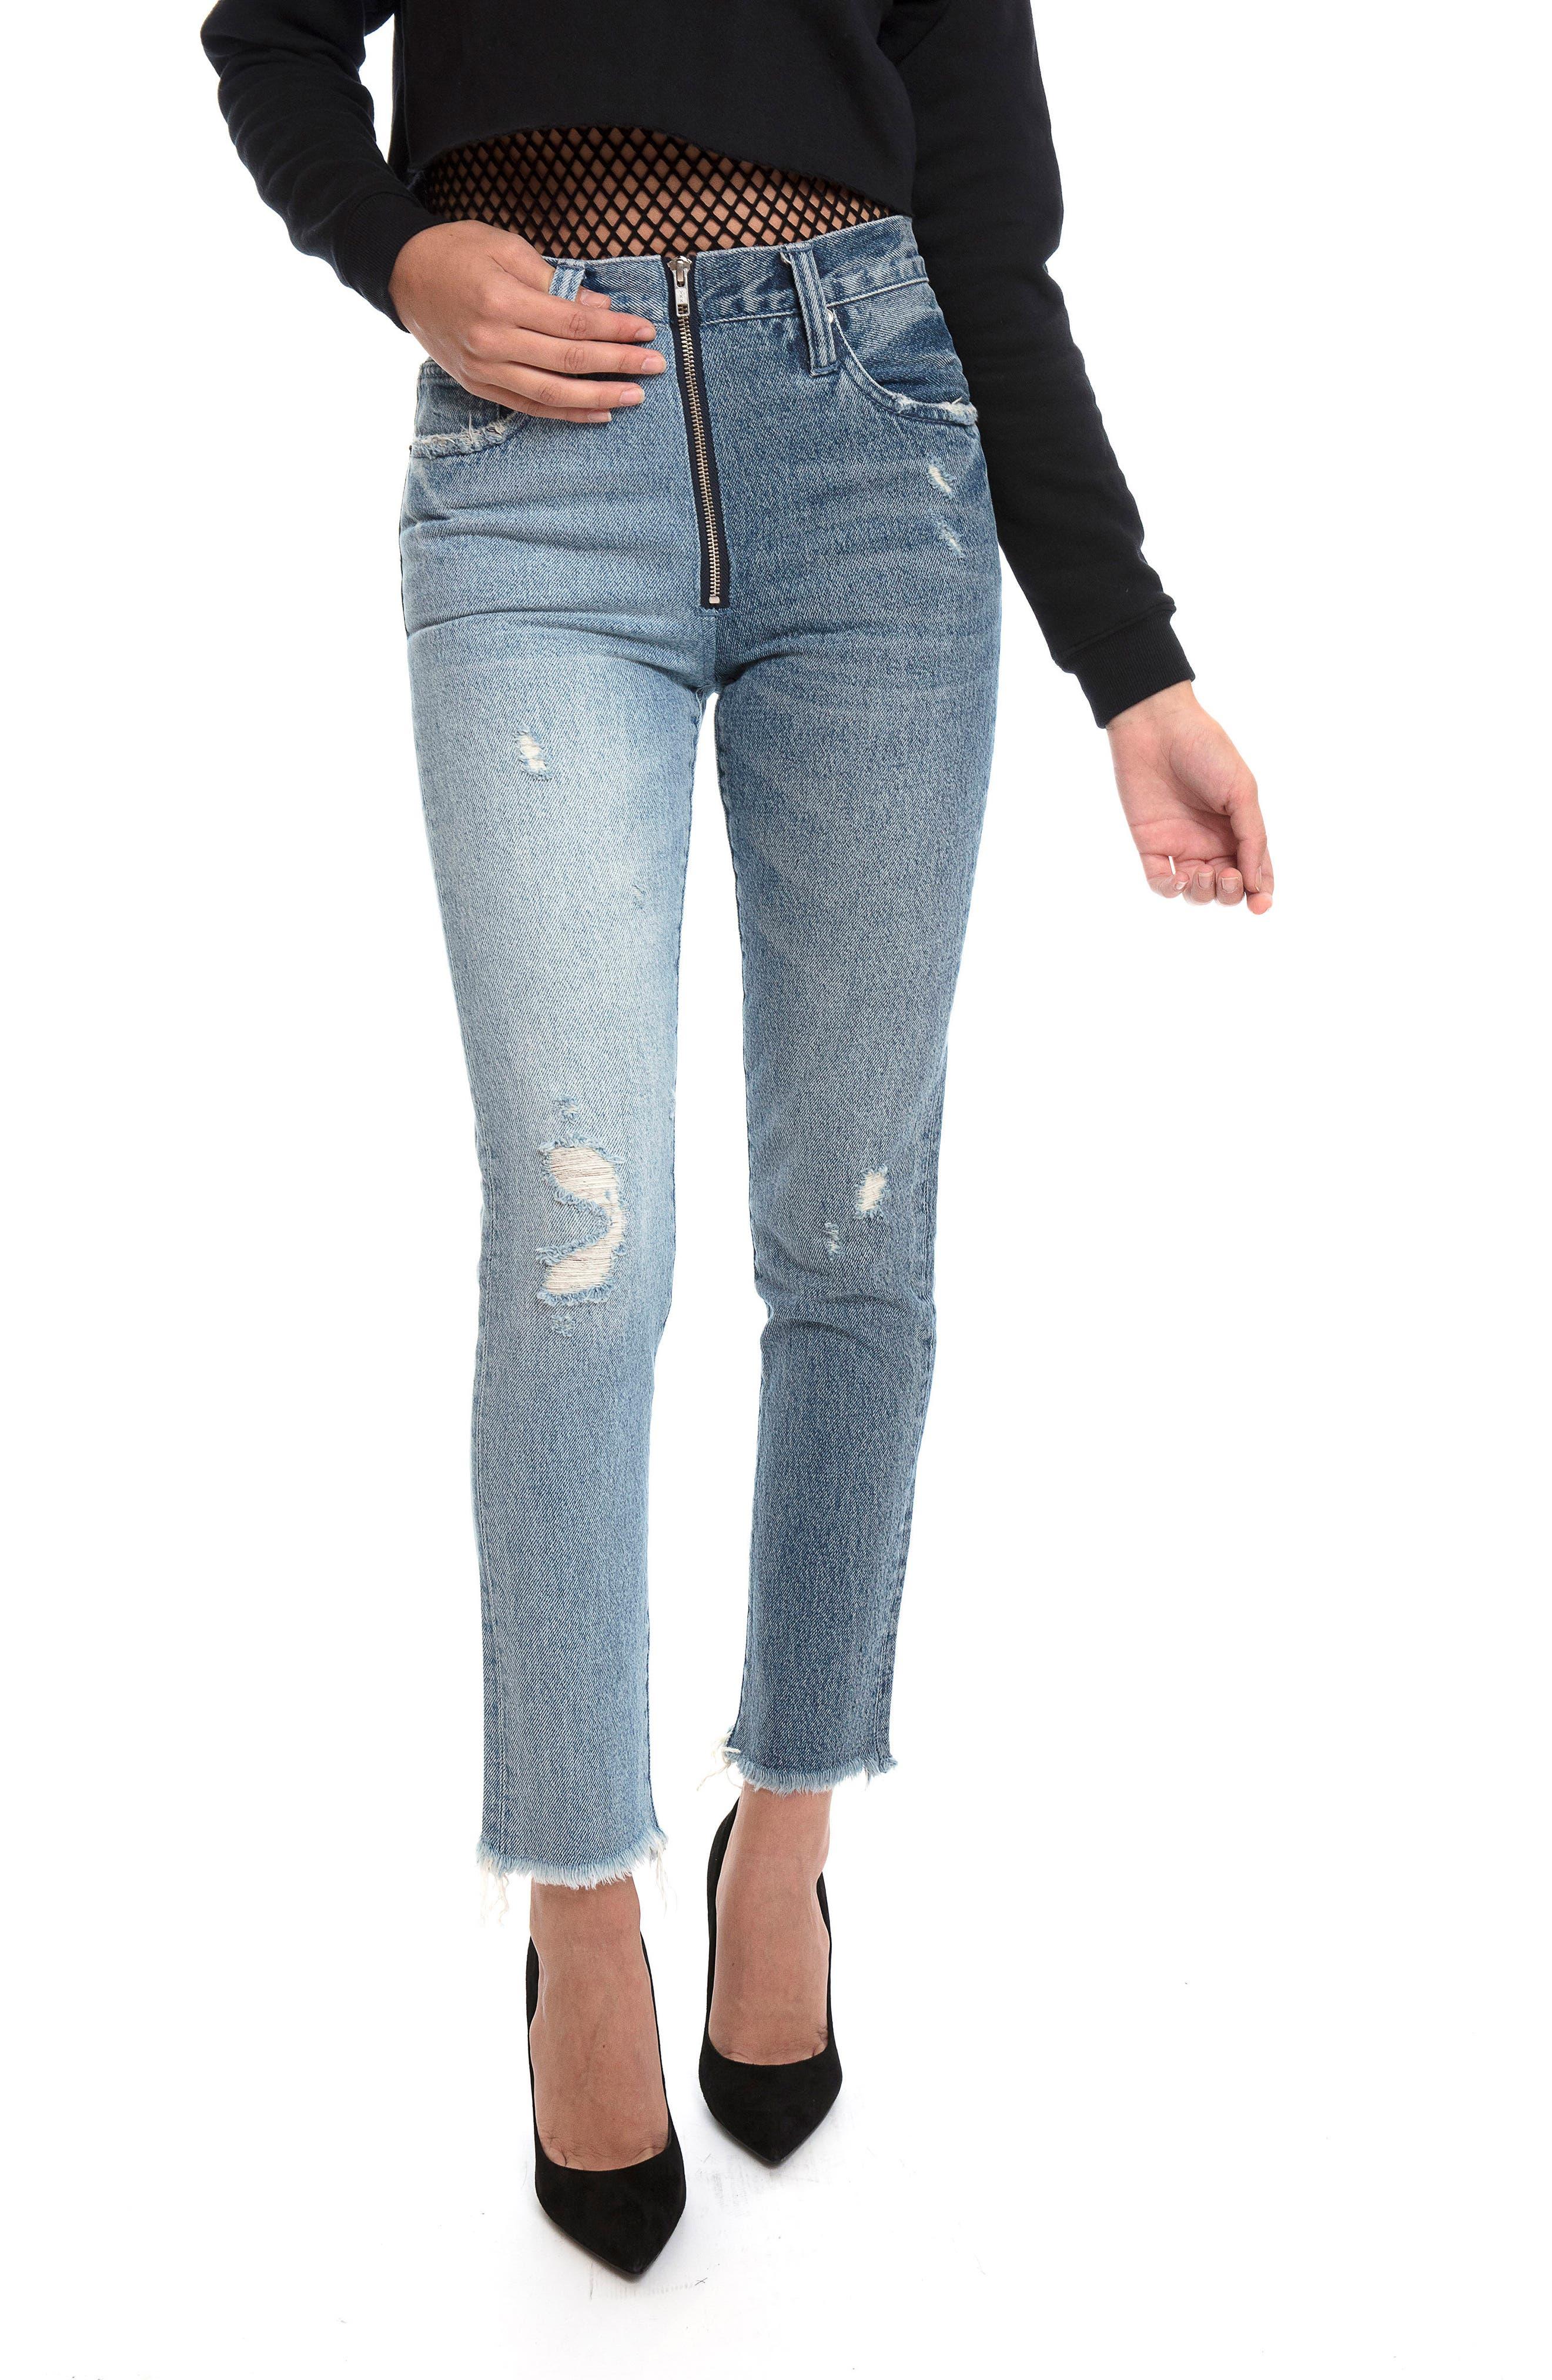 Chevelle Ankle Skinny Jeans,                             Alternate thumbnail 2, color,                             490